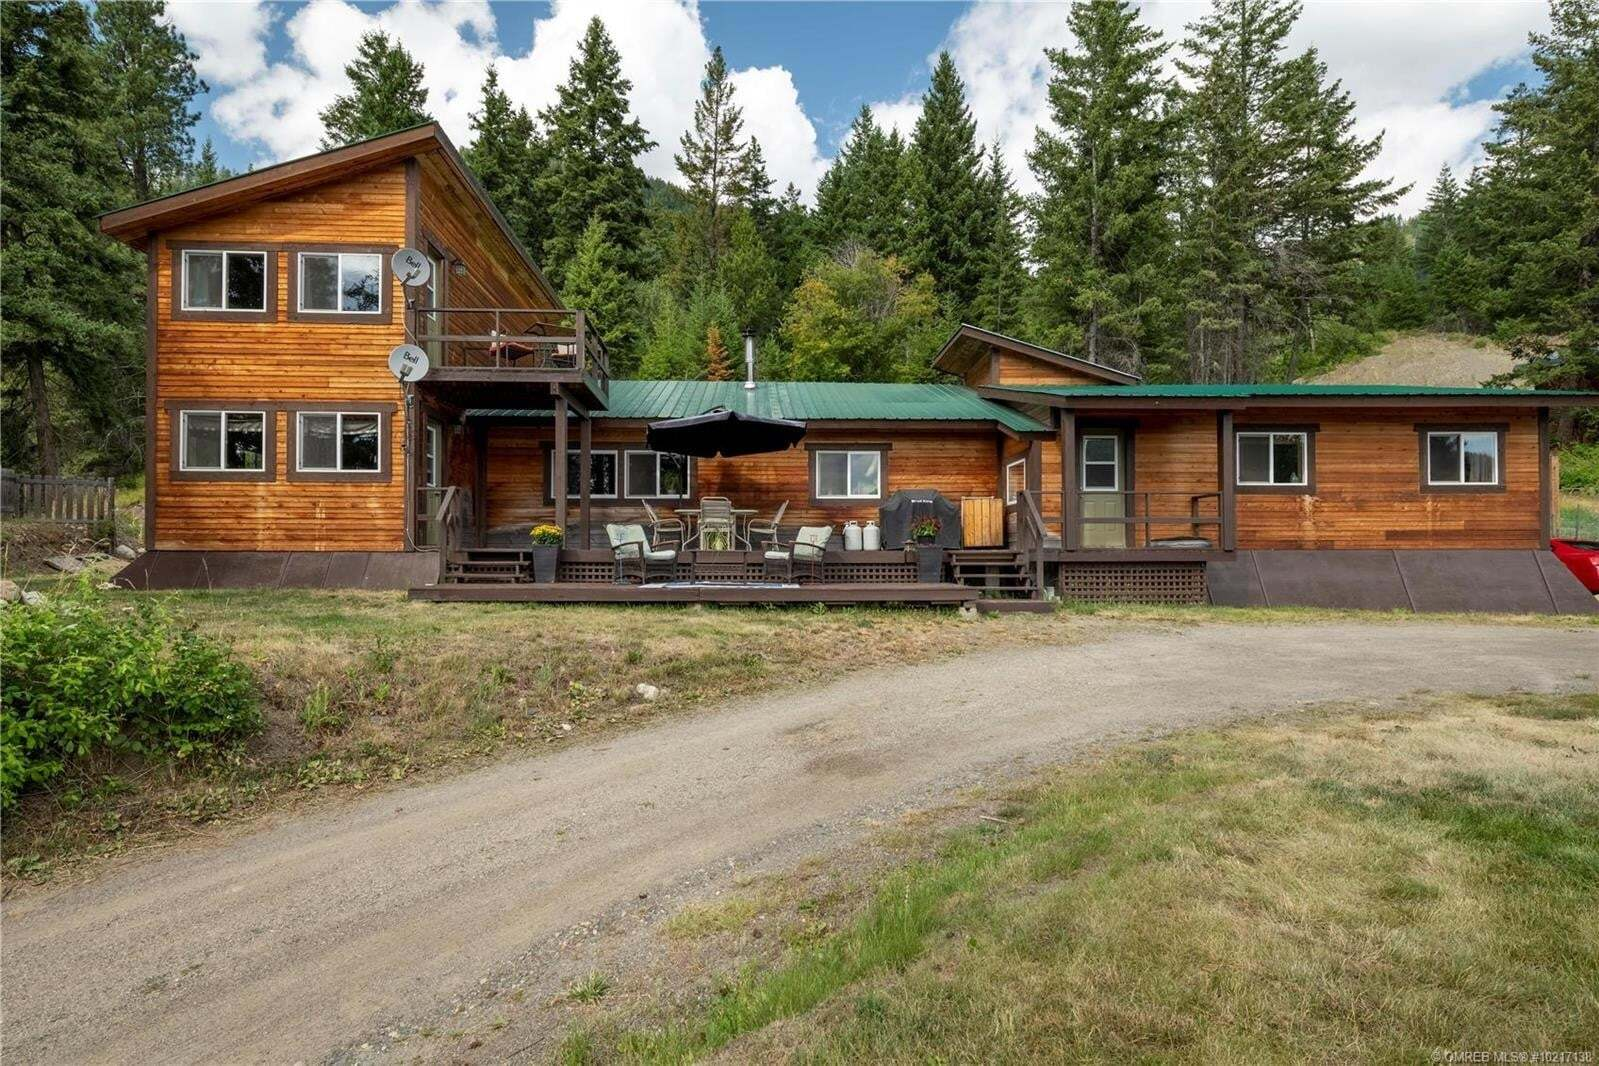 House for sale at 4991 Bolean Lake Rd Falkland British Columbia - MLS: 10217138